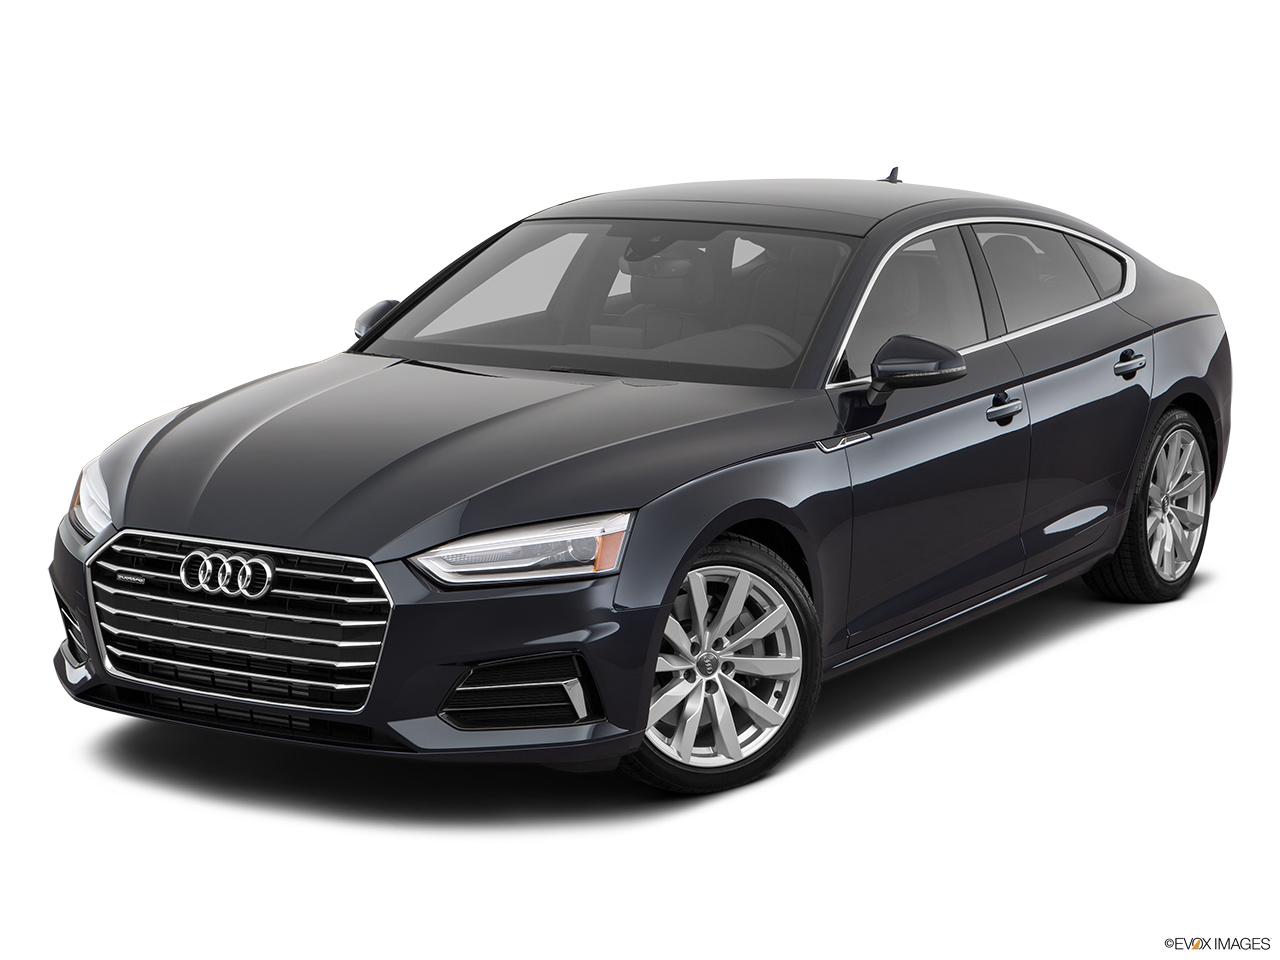 car features list for audi a5 sportback 2018 45 tfsi sport quattro 252 hp bahrain yallamotor. Black Bedroom Furniture Sets. Home Design Ideas